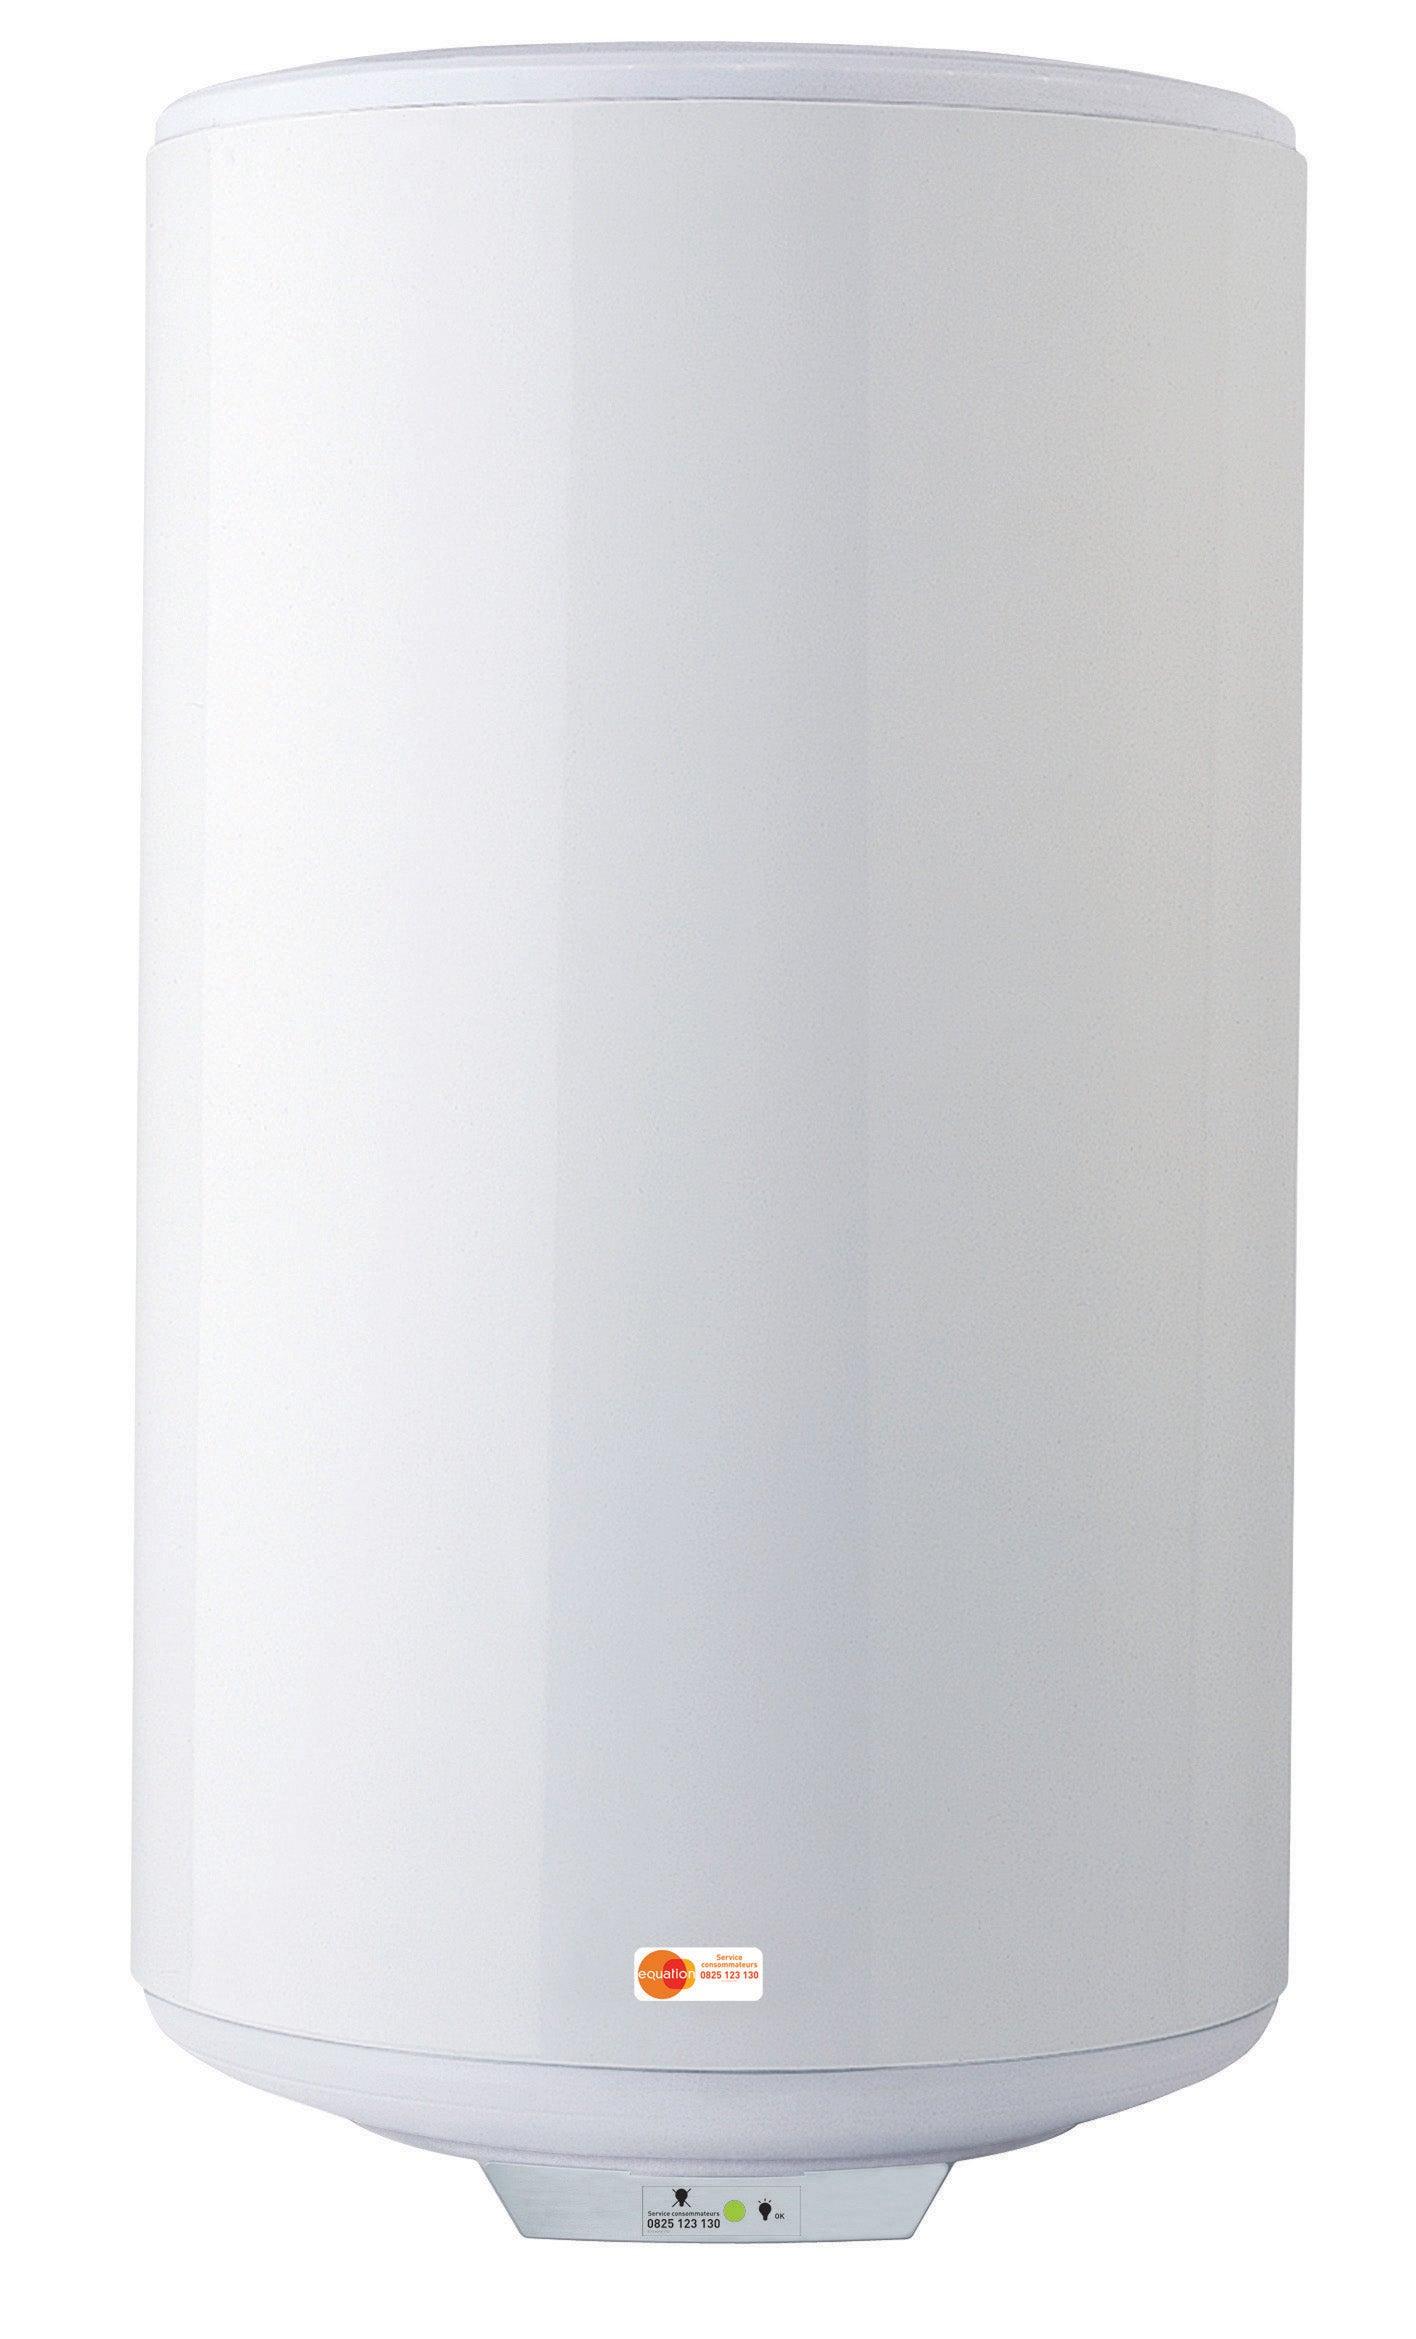 Chauffe Eau Electrique Horizontal Mural Sorties De Cote 200 L Leroy Merlin